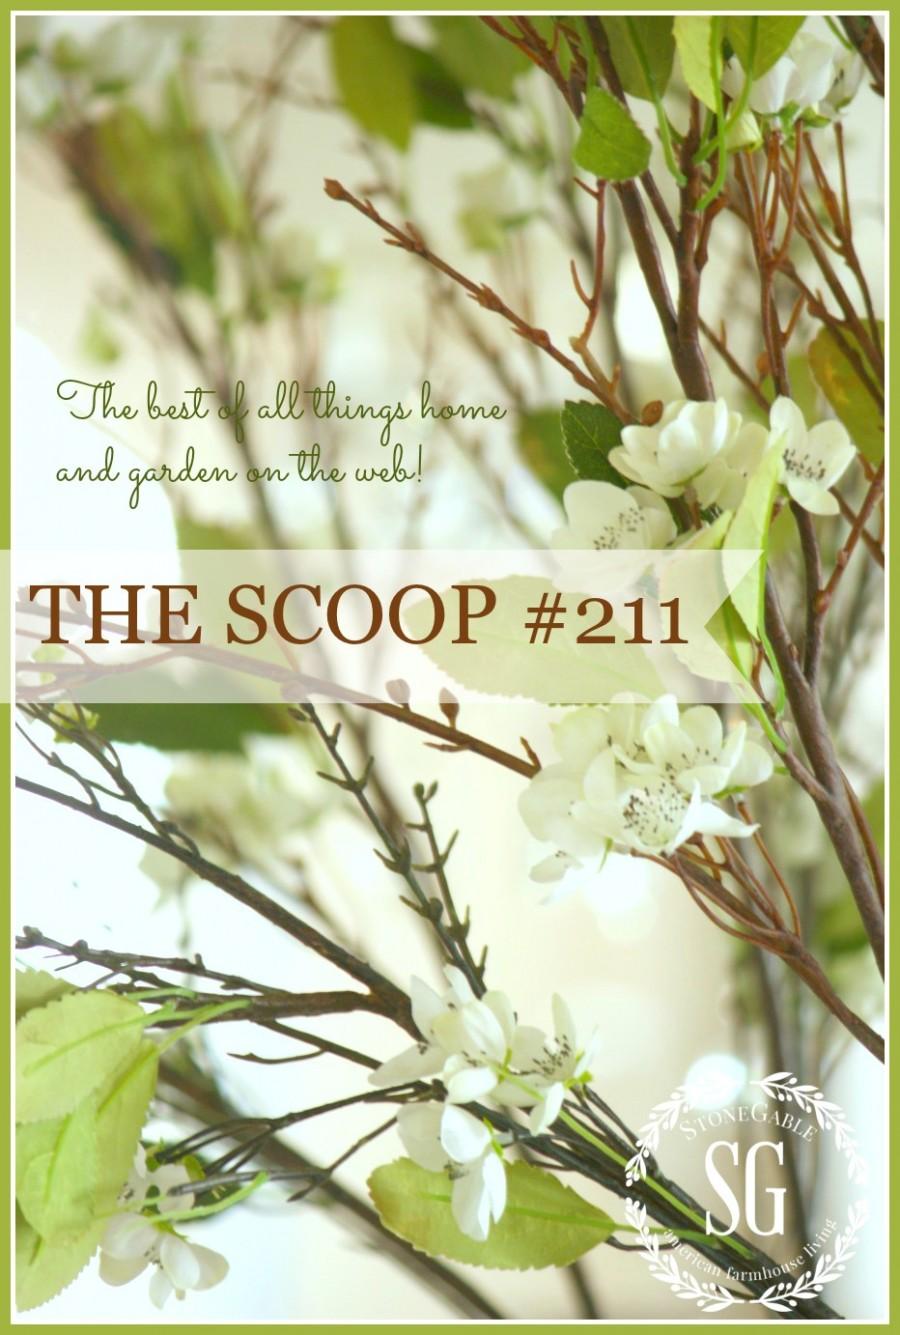 THE SCOOP #211-stonegableblog.com